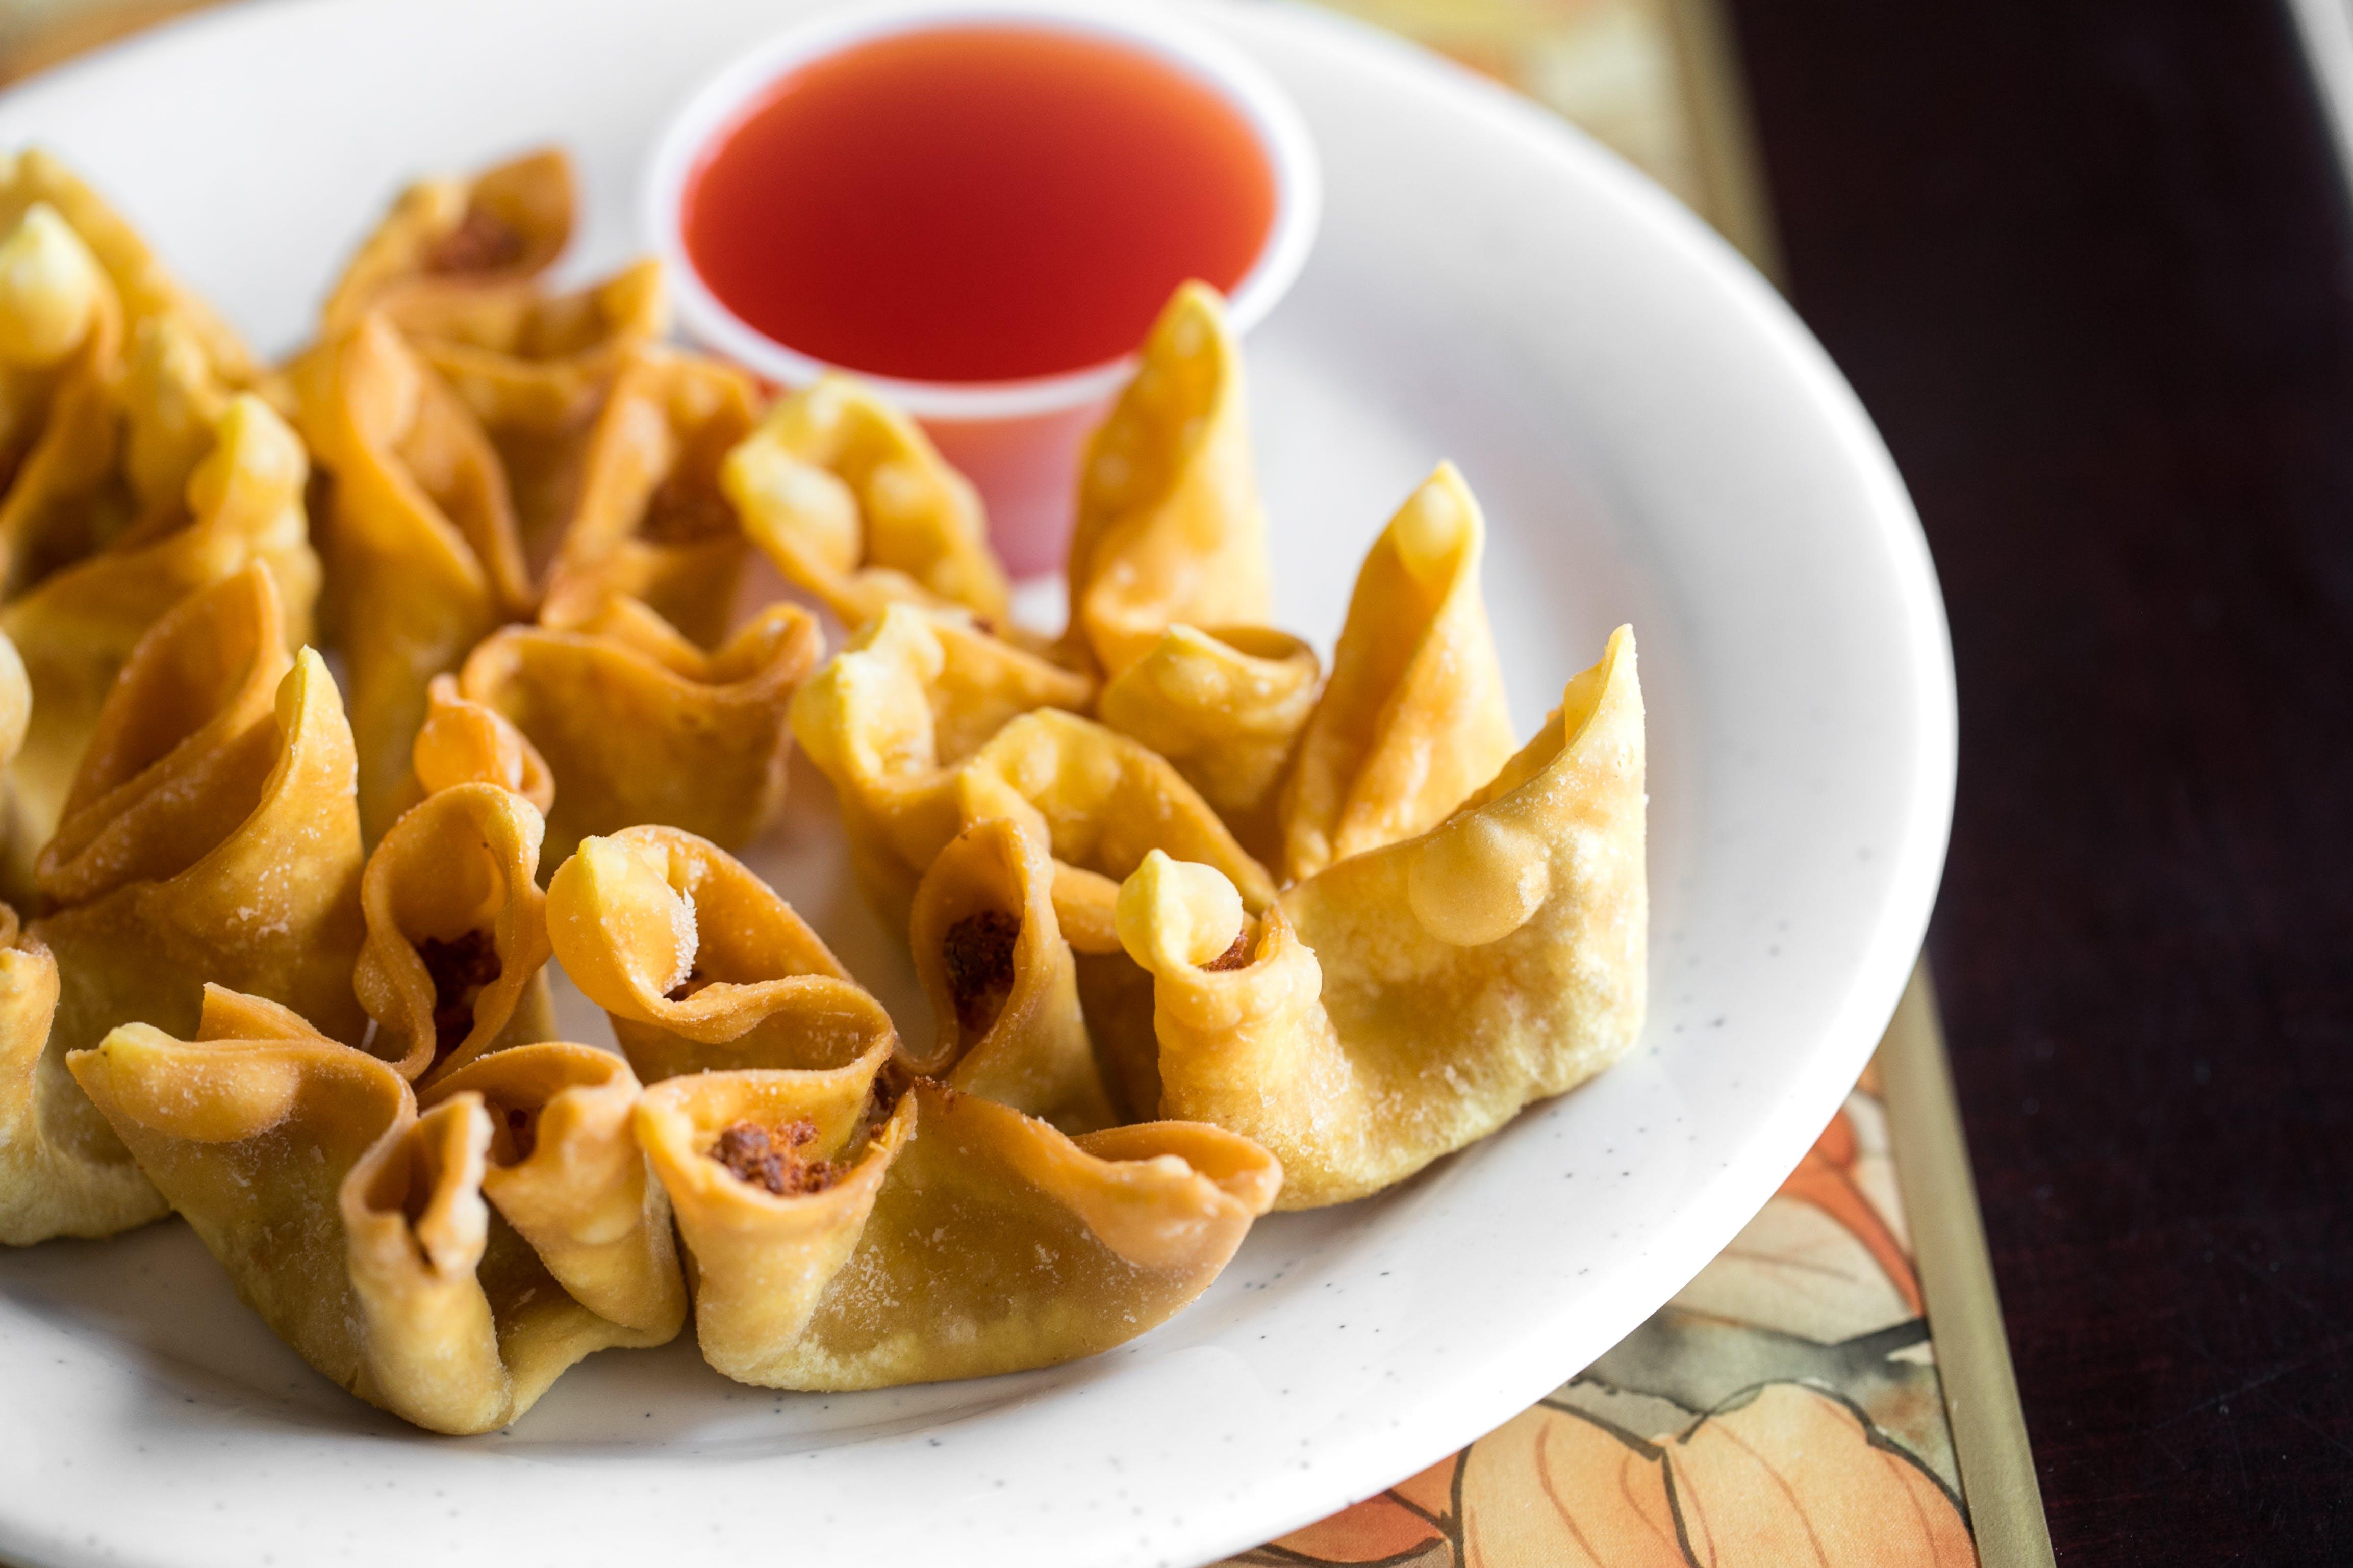 15. Fried Crab Rangoon (8) from Good Taste Chinese Restaurant in Richmond, VA